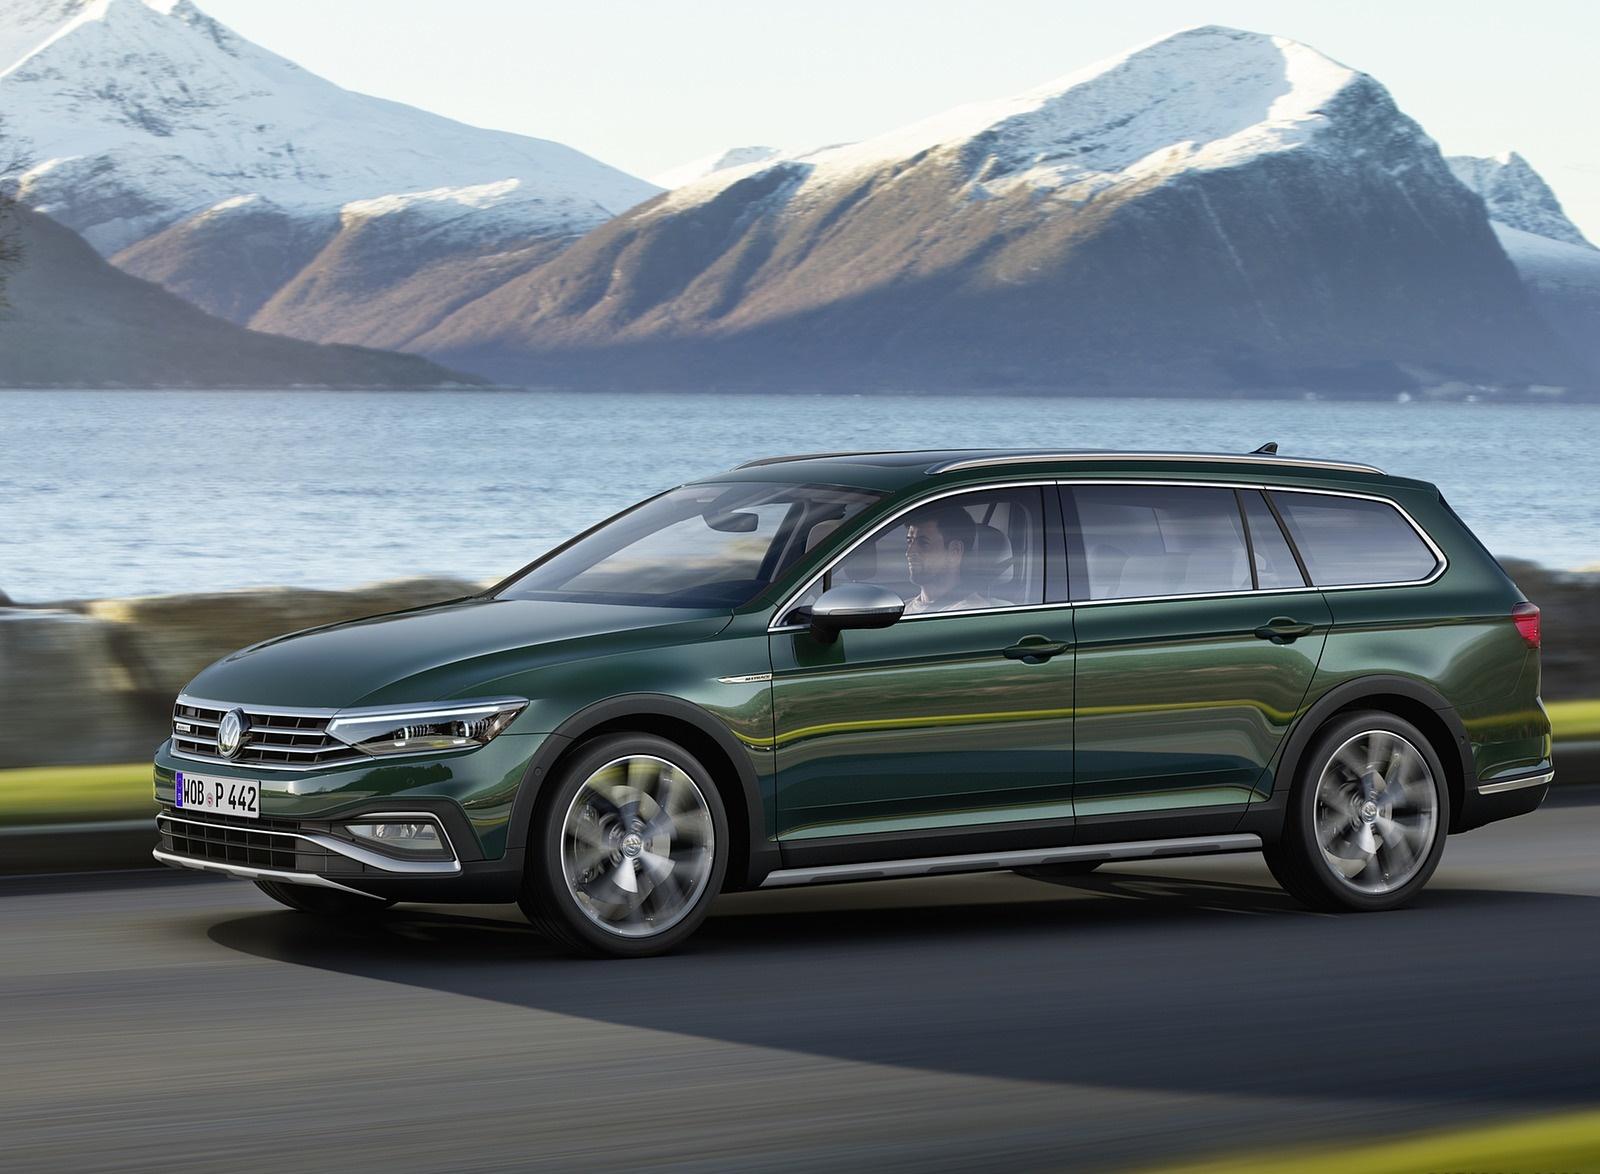 2020 Volkswagen Passat Alltrack (EU-Spec) Front Three-Quarter Wallpapers (2)